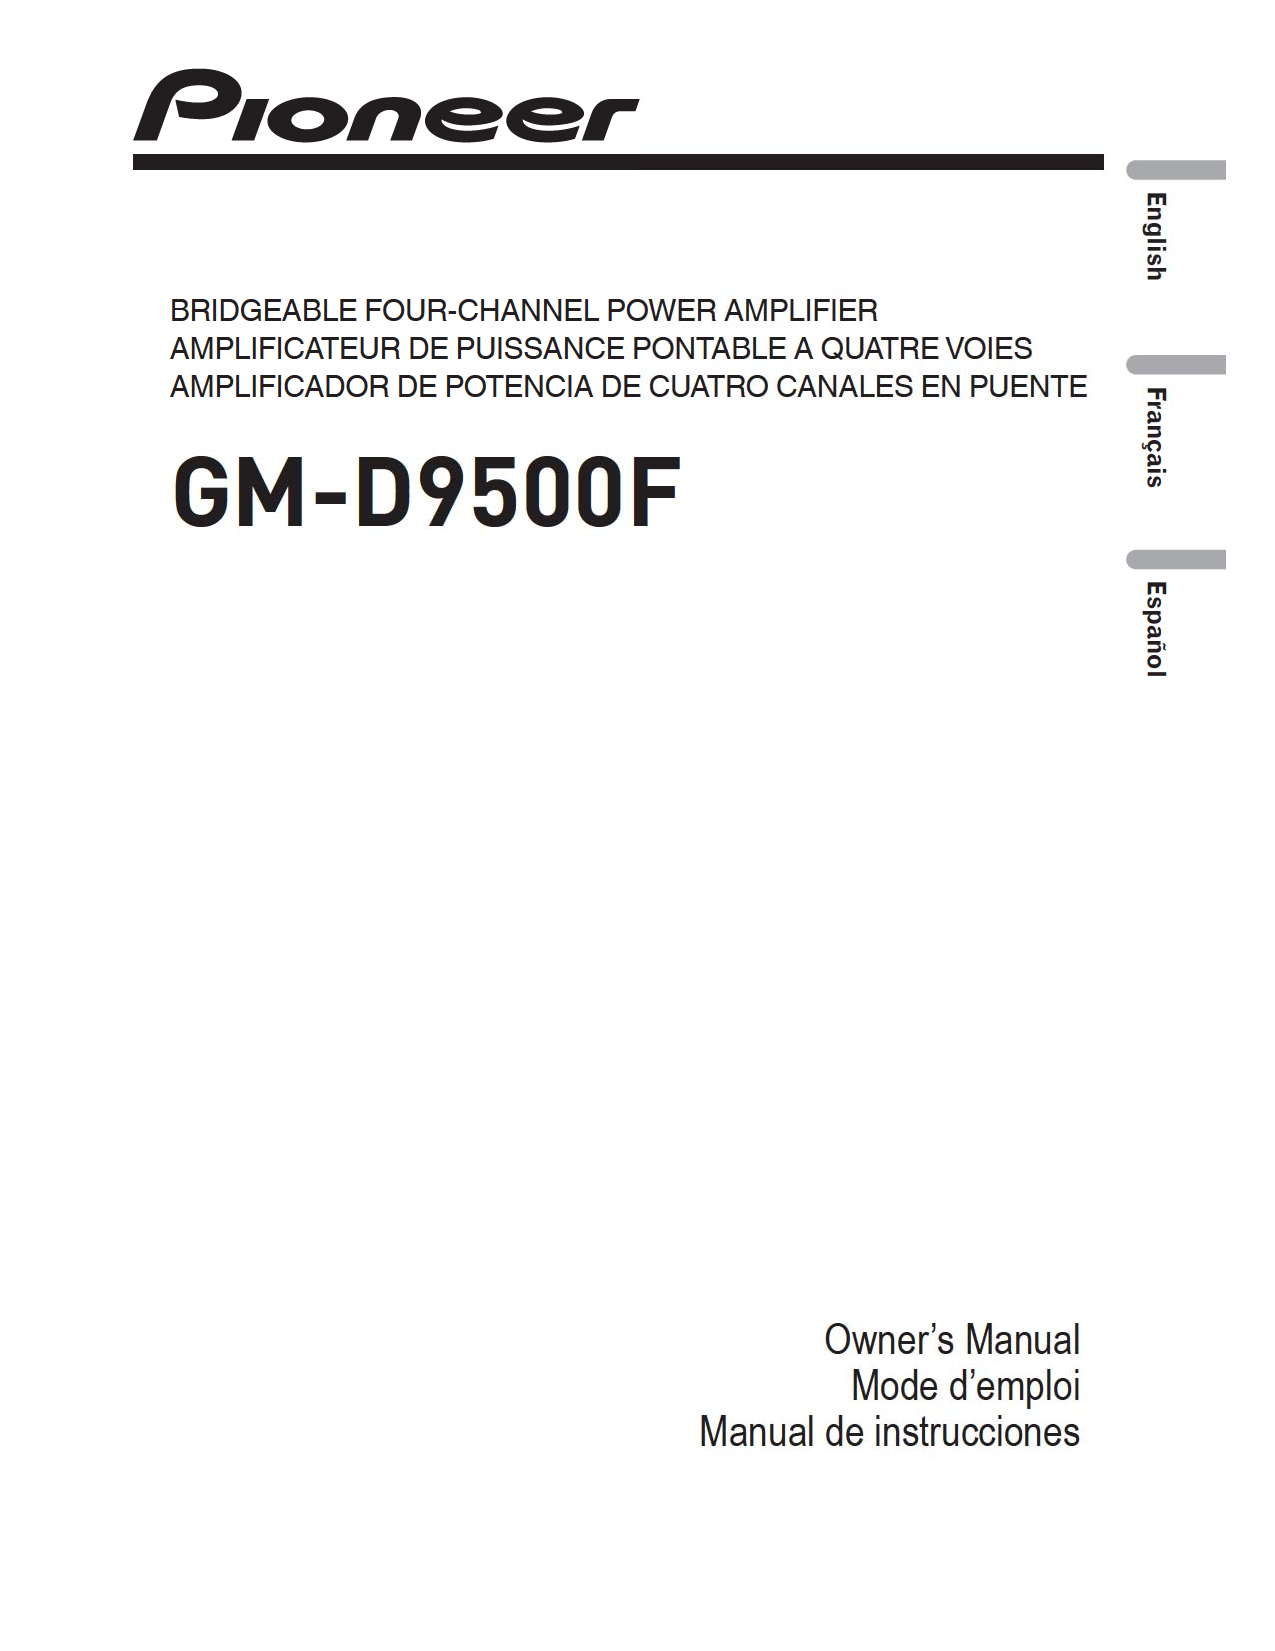 GM D9500F.pdf 0 pdf manual for pioneer car amplifier gm d9500f pioneer gm-d9500f wiring diagram at mifinder.co